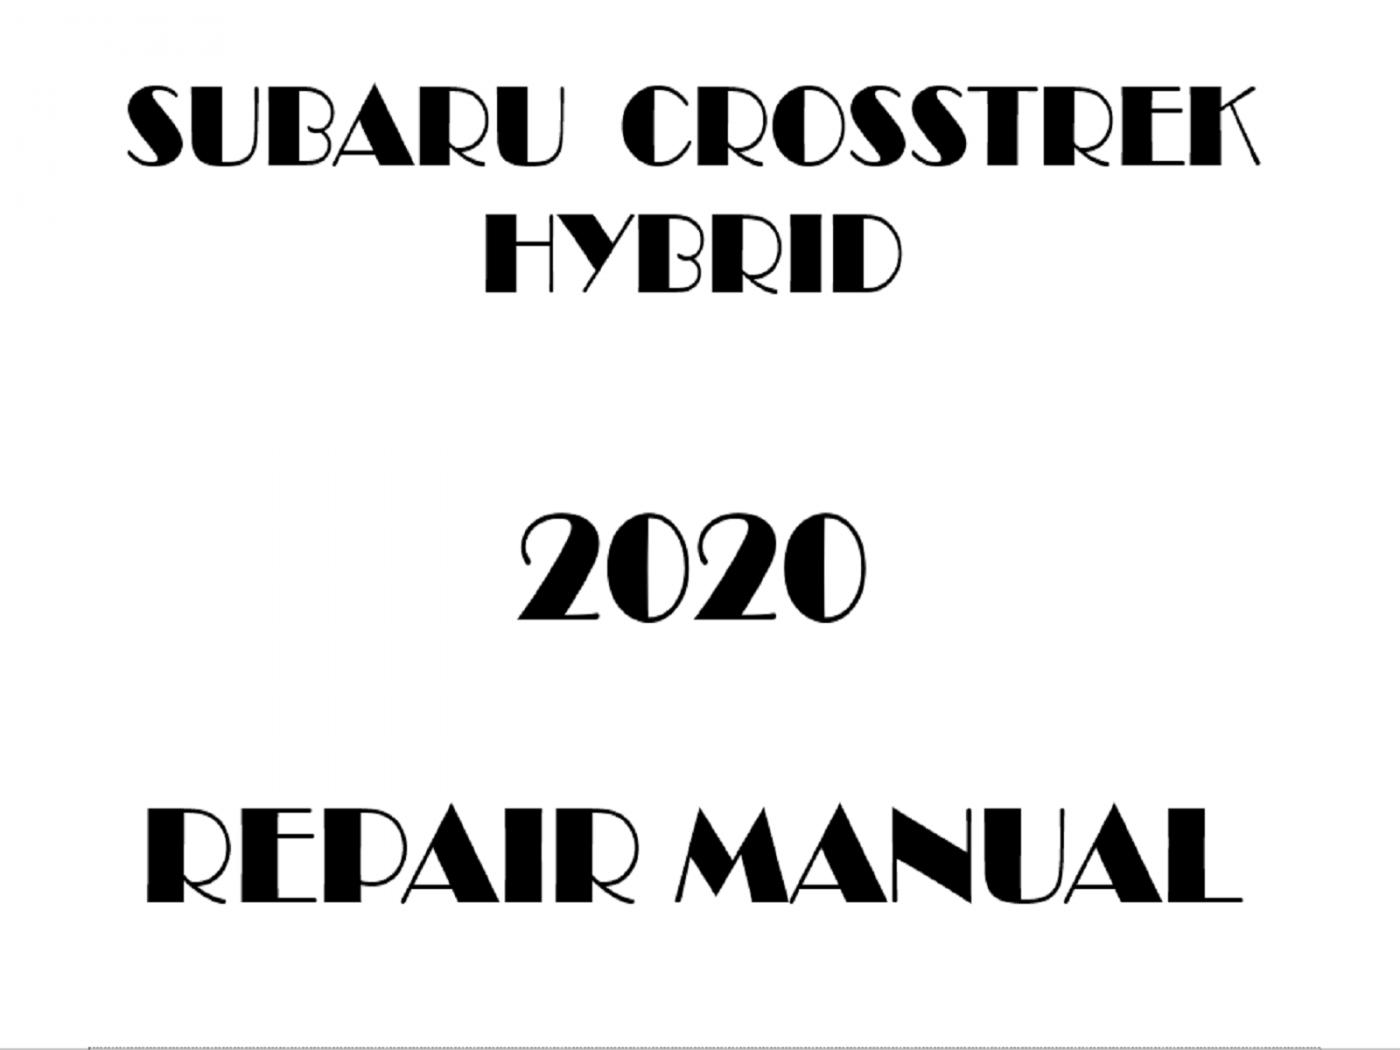 2020 Subaru Crosstrek Hybrid repair manual